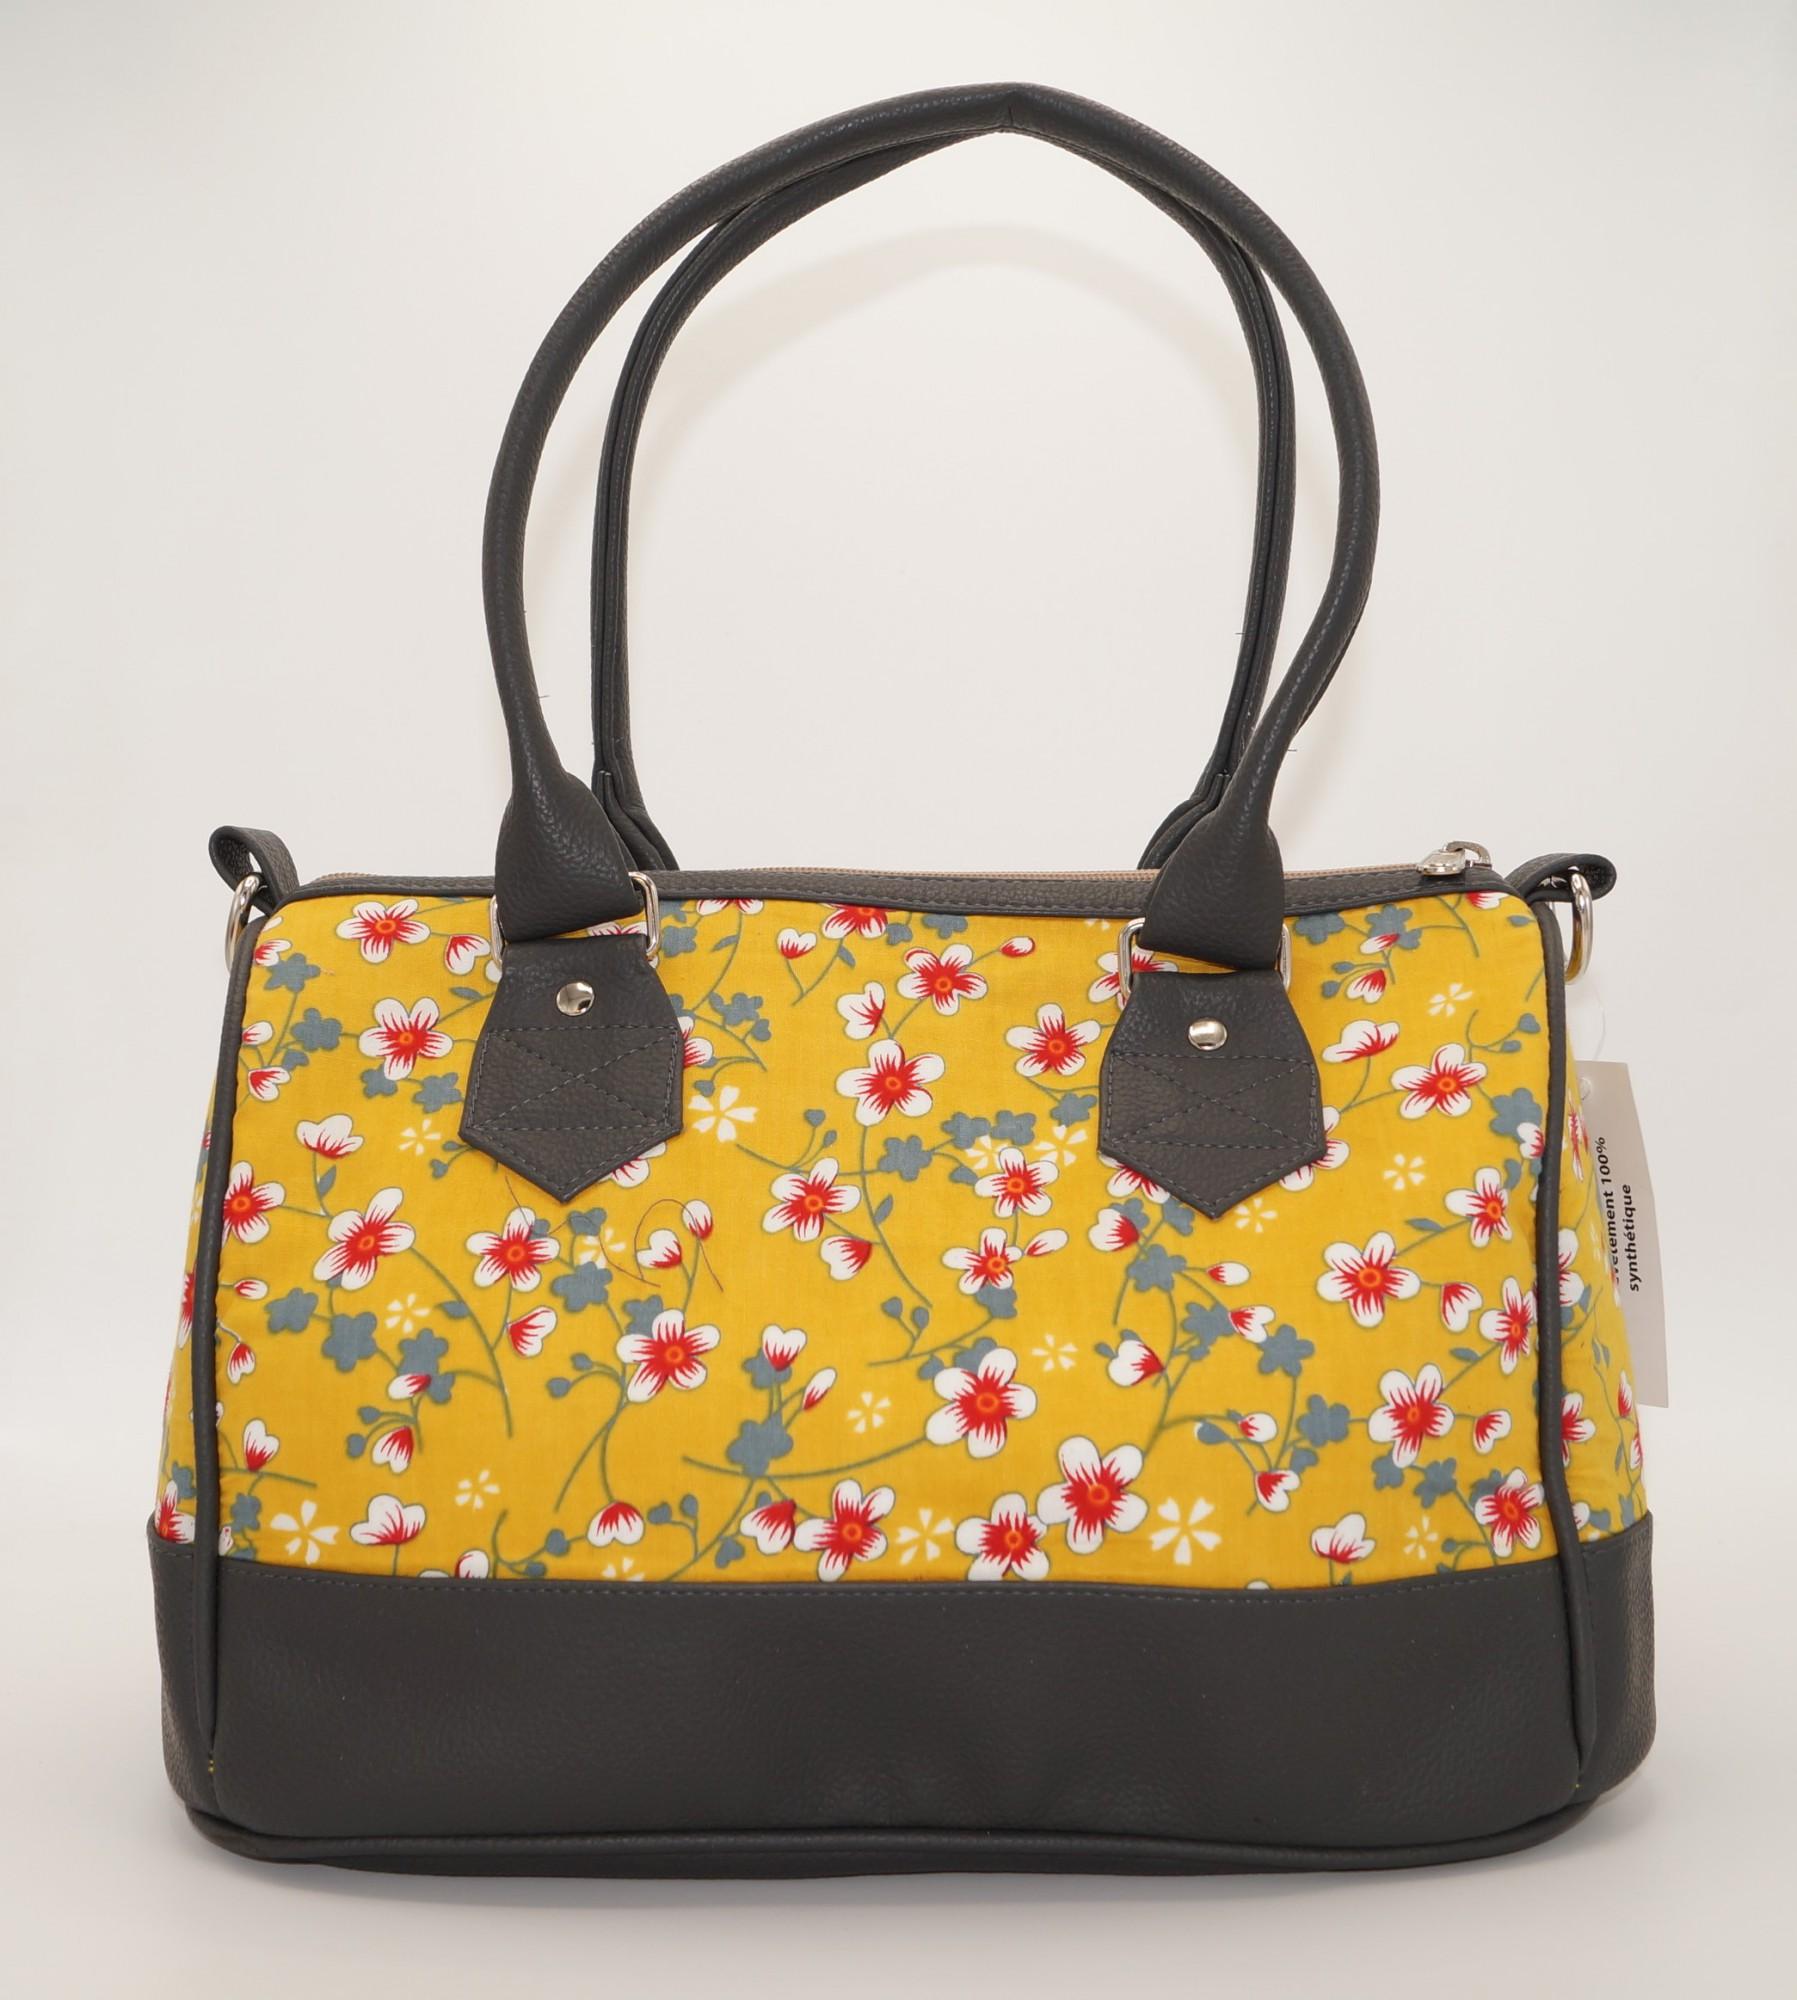 Petit sac Bowling imprimé multicolore Bibop & Lula